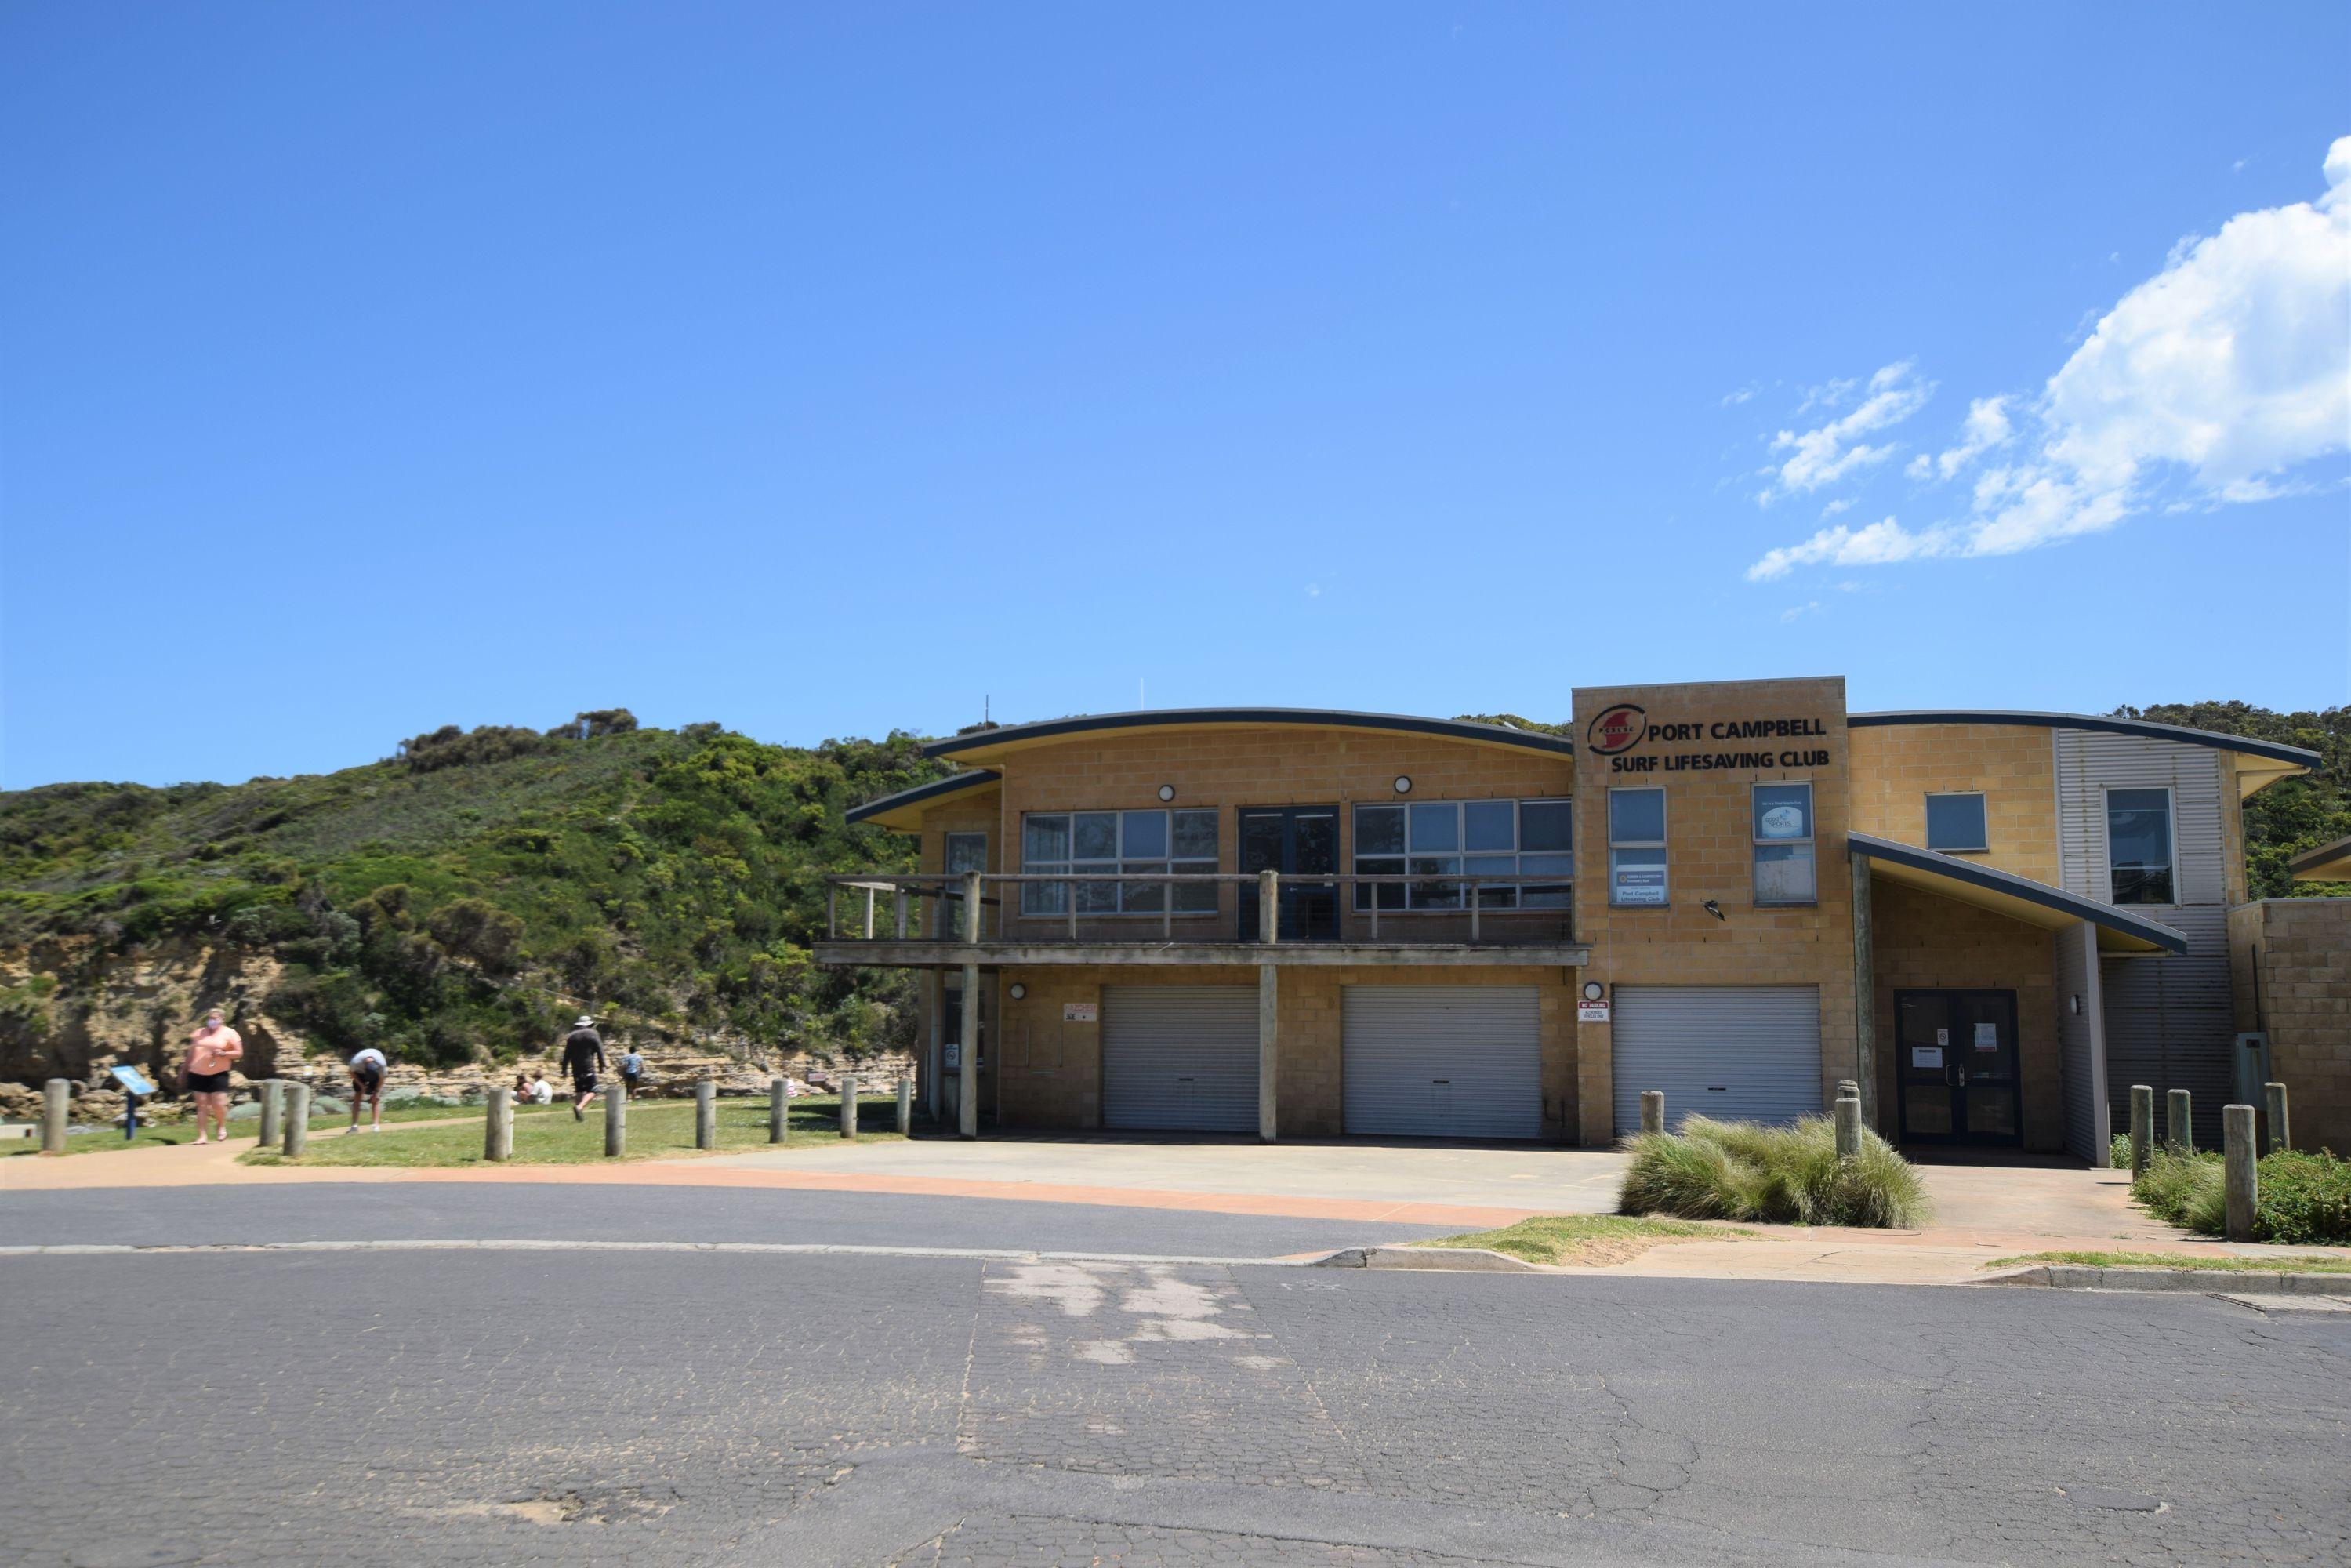 2/32 Cairns Street, Port Campbell, VIC 3269